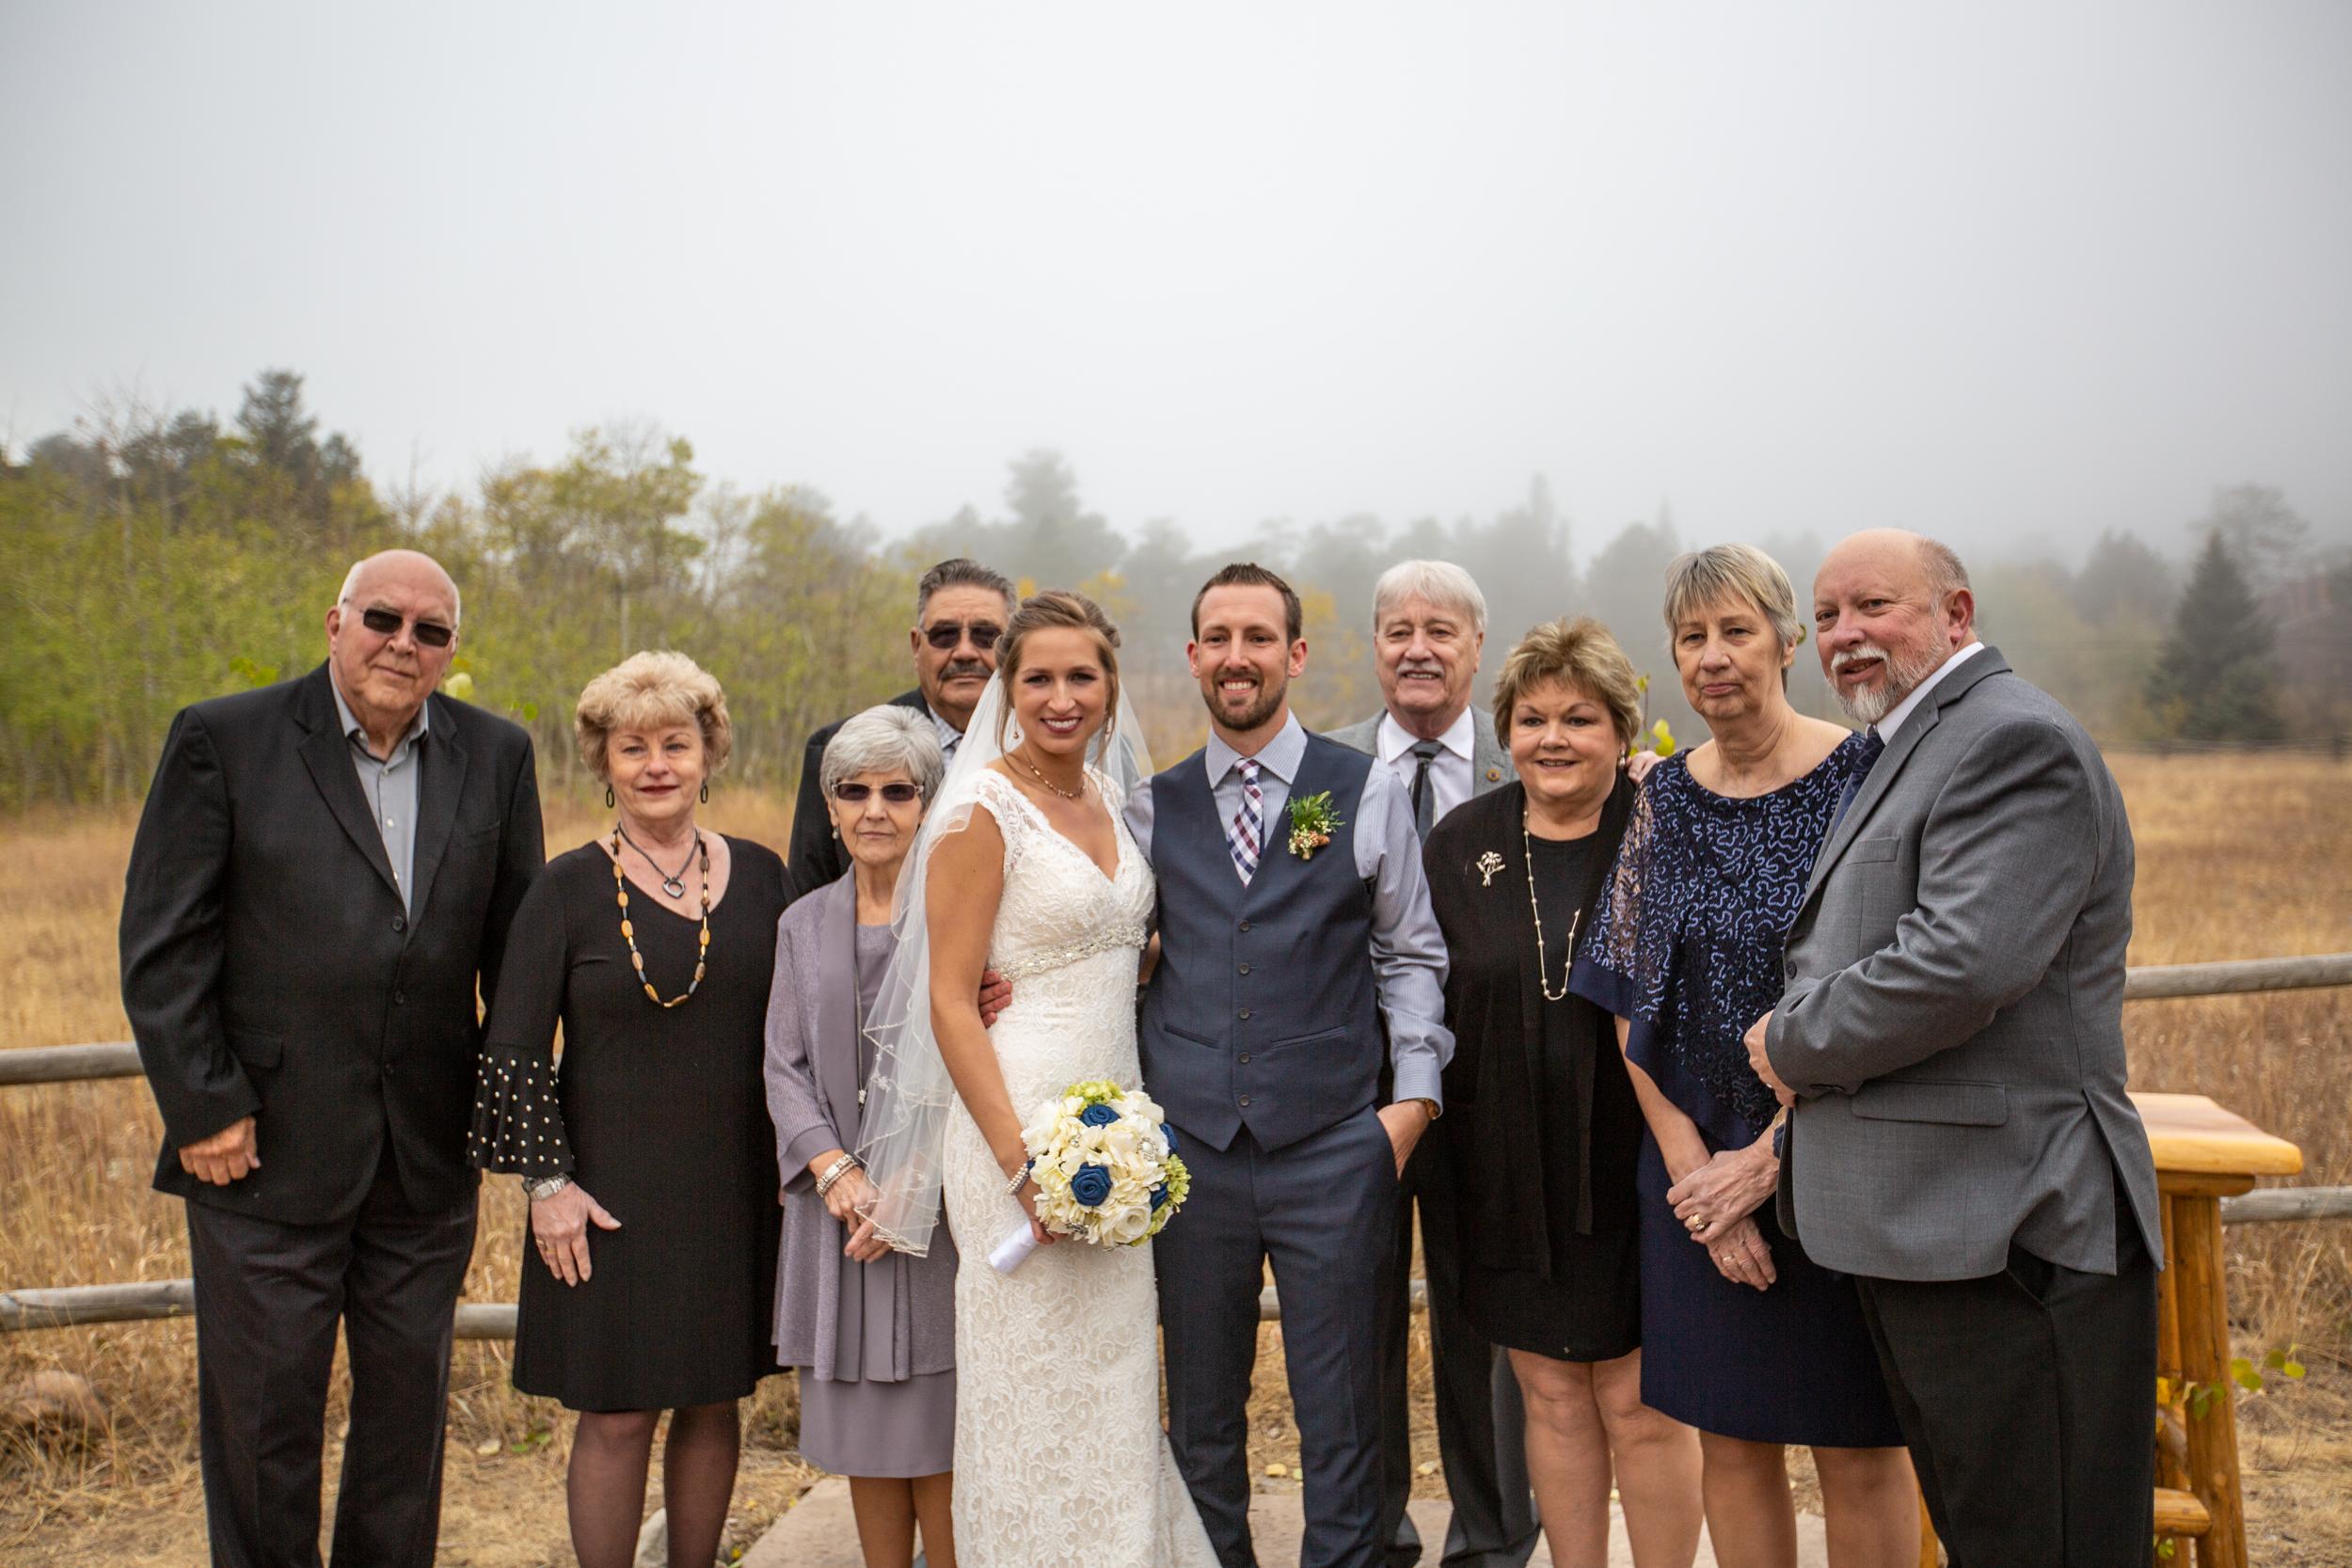 Wedding Party-5.jpg